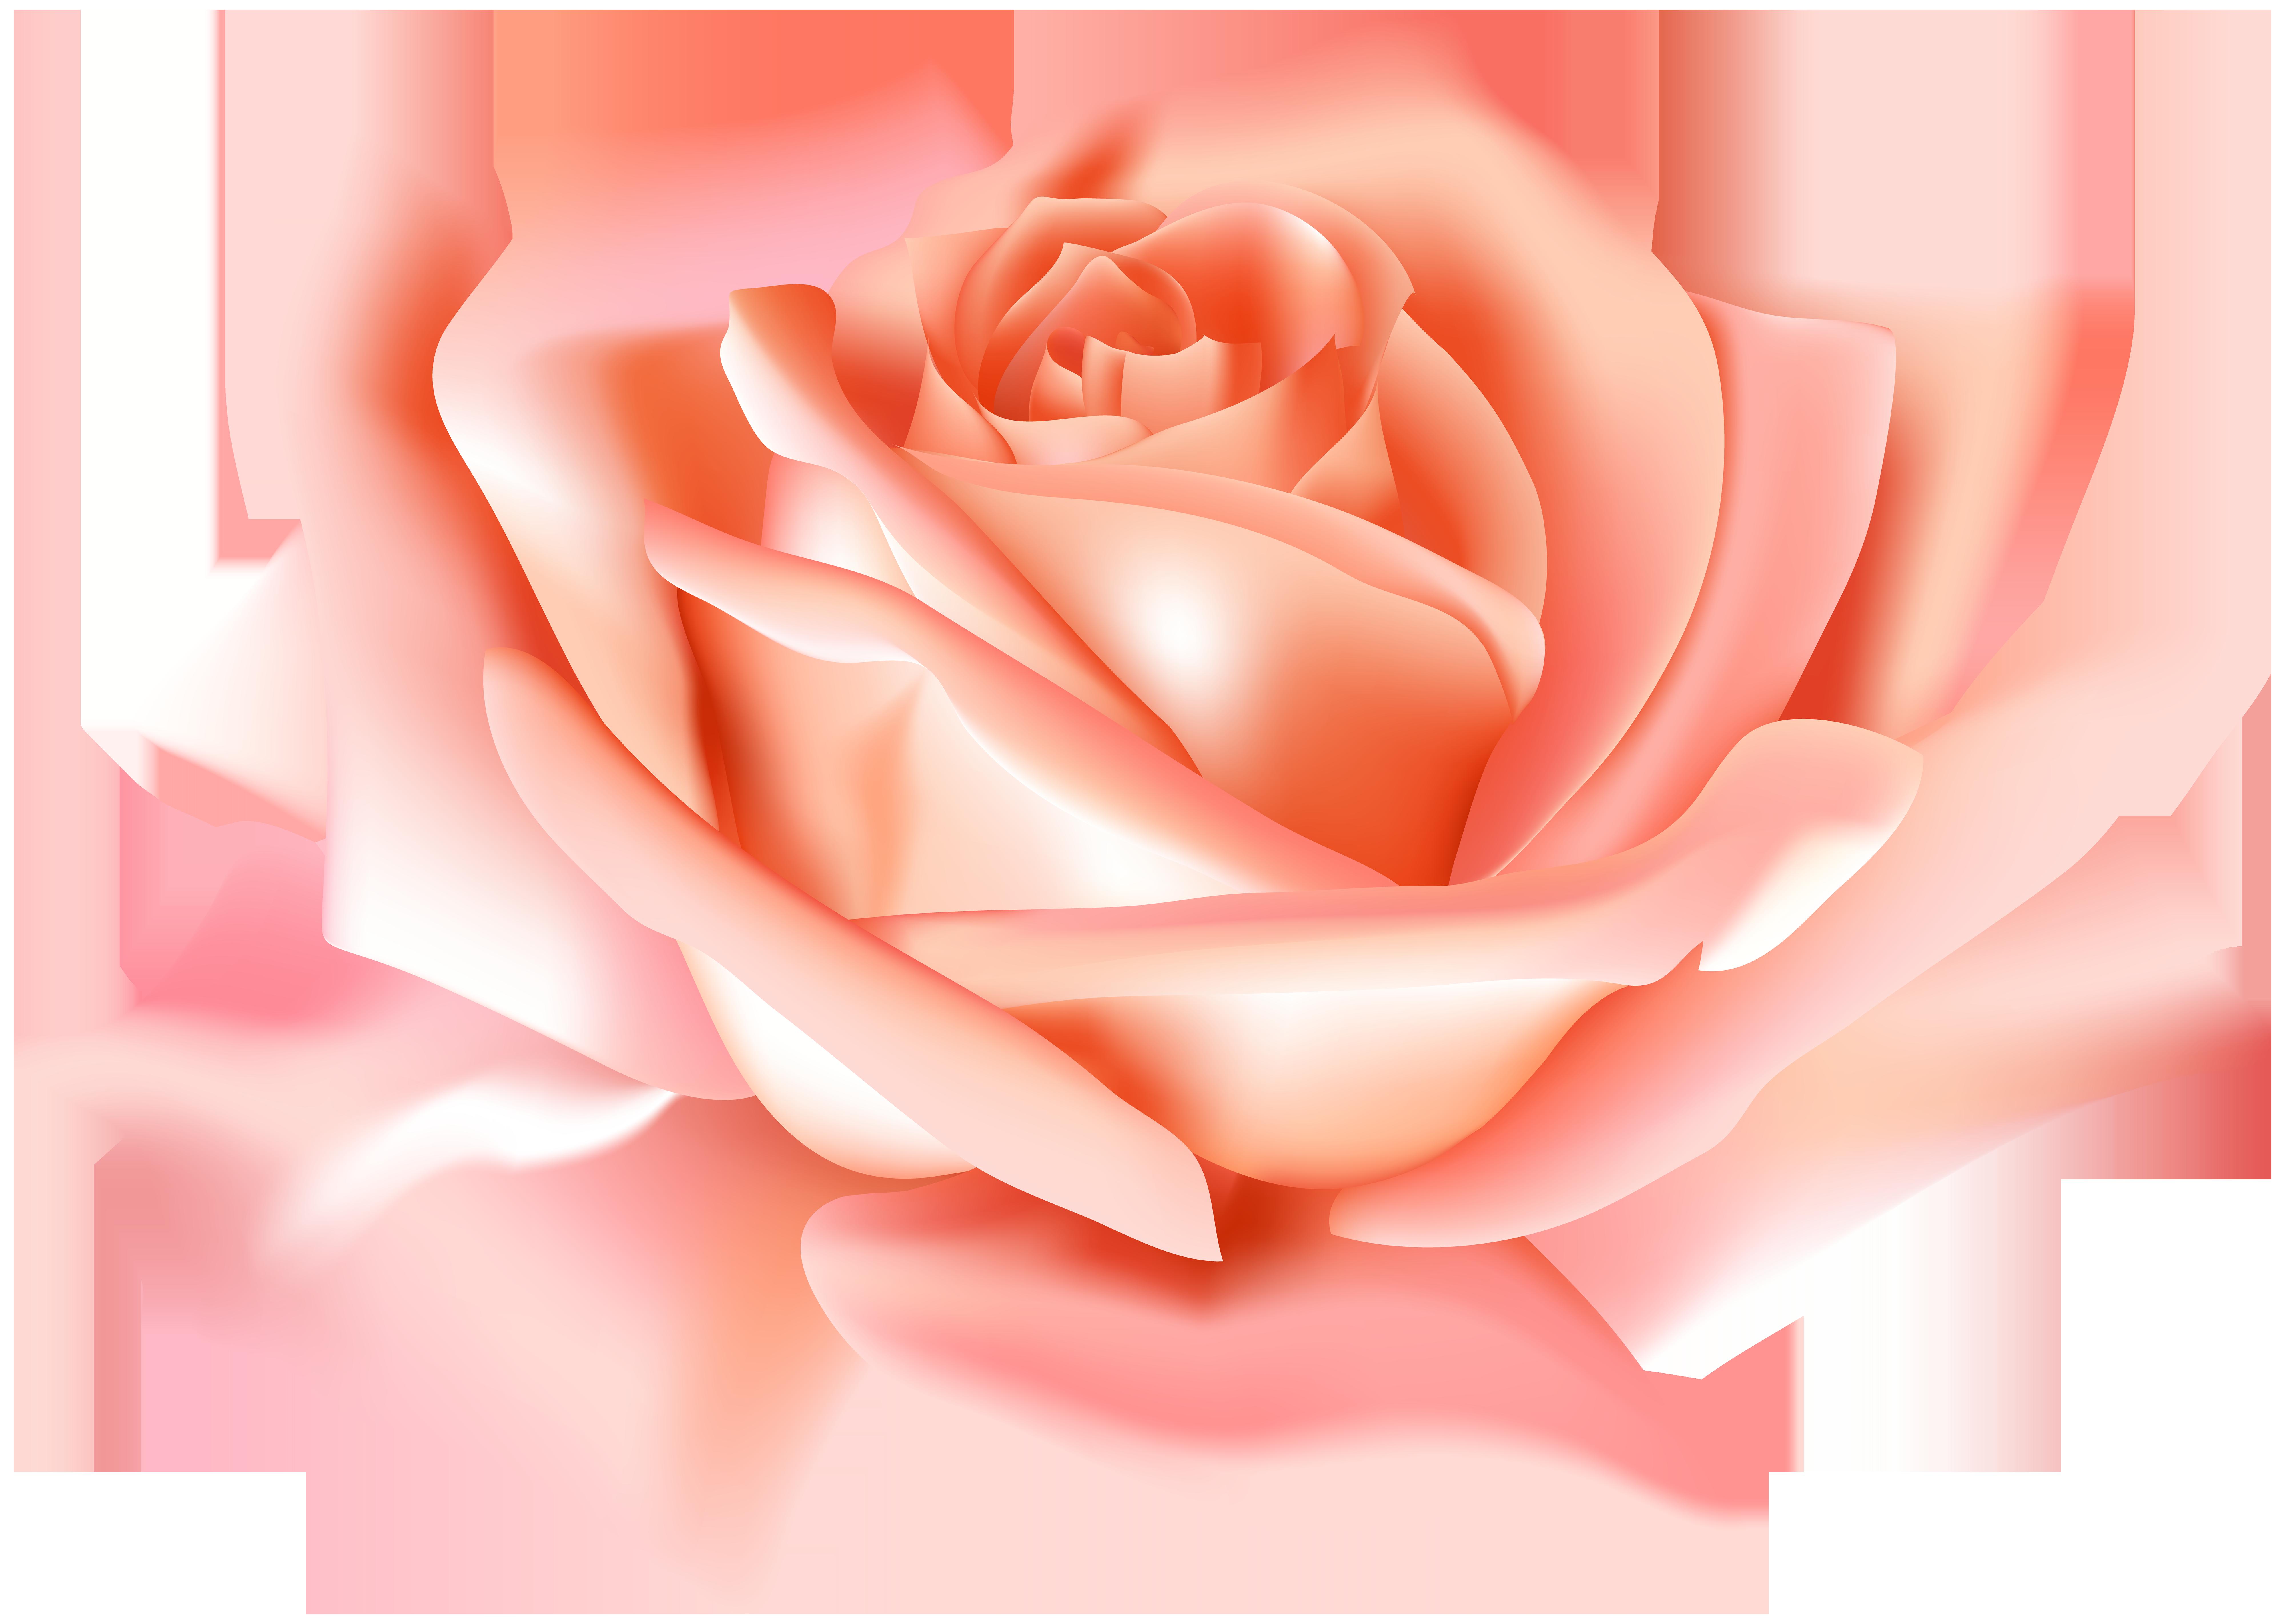 Peach flower clipart svg transparent stock Peach Rose Flower PNG Clip Art Image | Gallery Yopriceville - High ... svg transparent stock